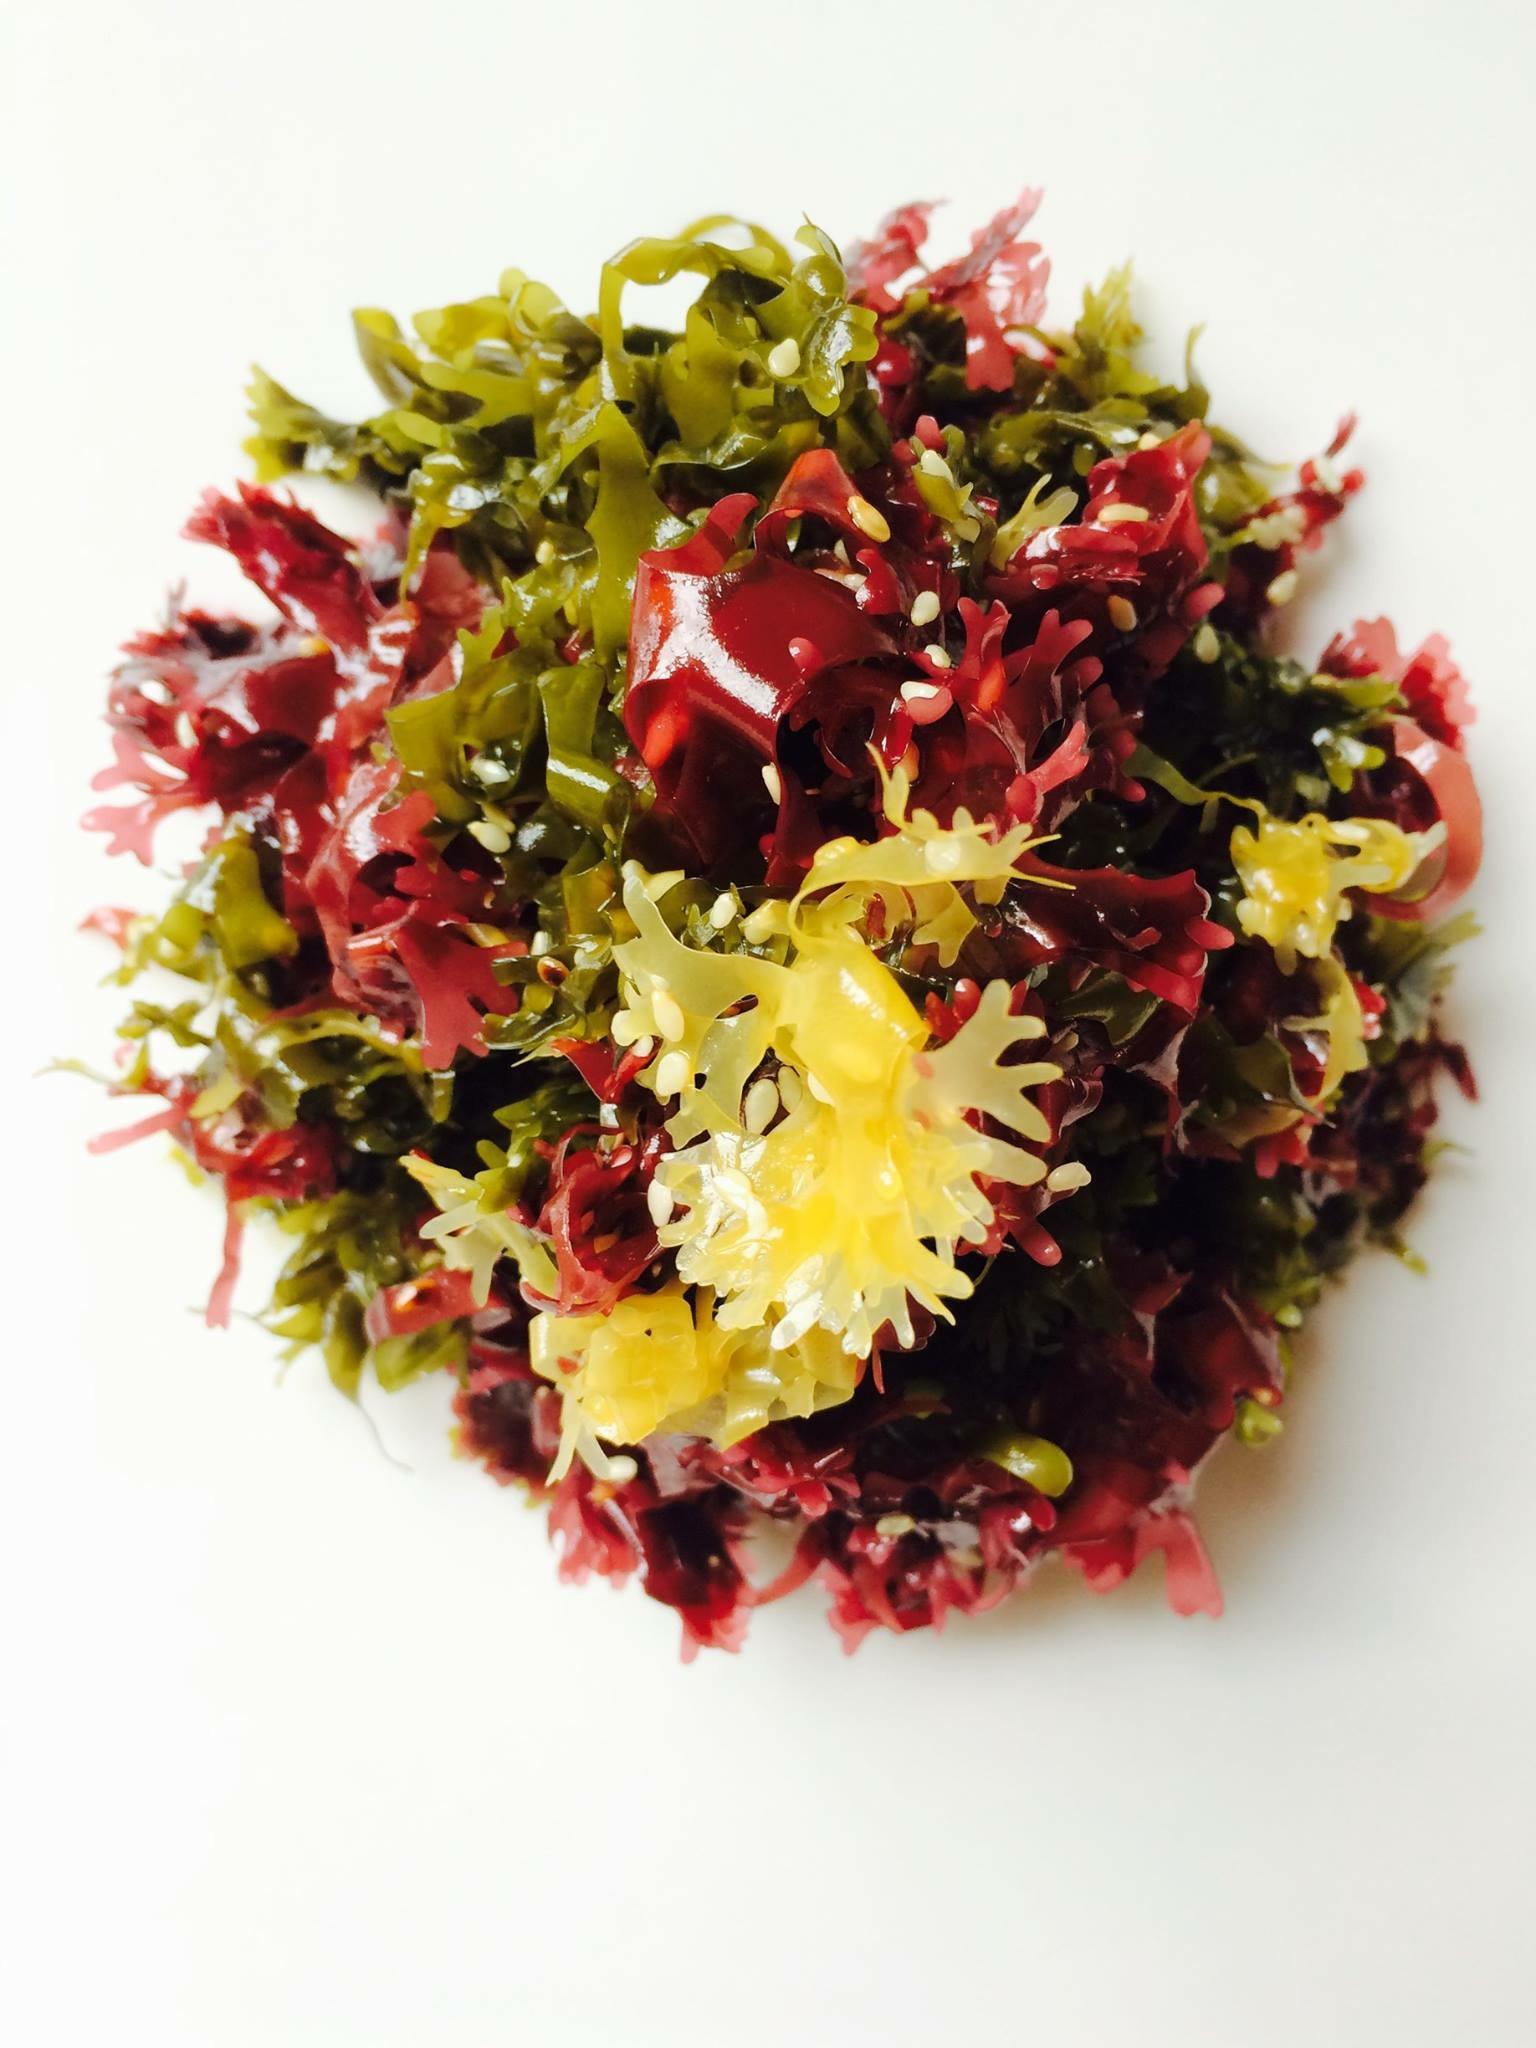 Kaiso Seaweed Salad